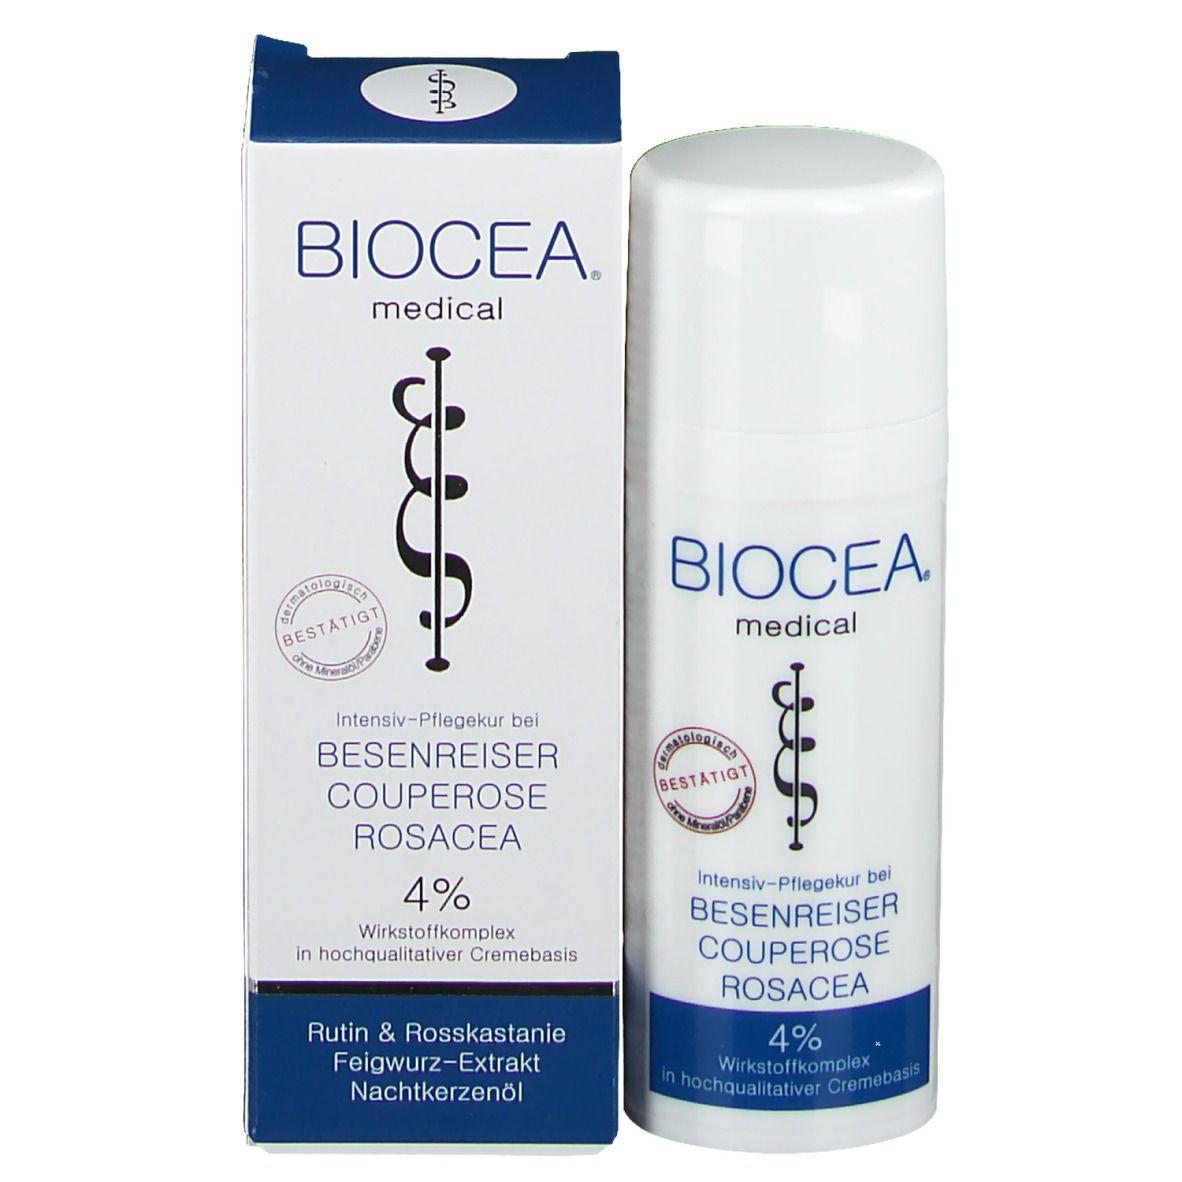 BIOCEA® Couperose Besenreiser Rosacea Creme 30 ml - shop